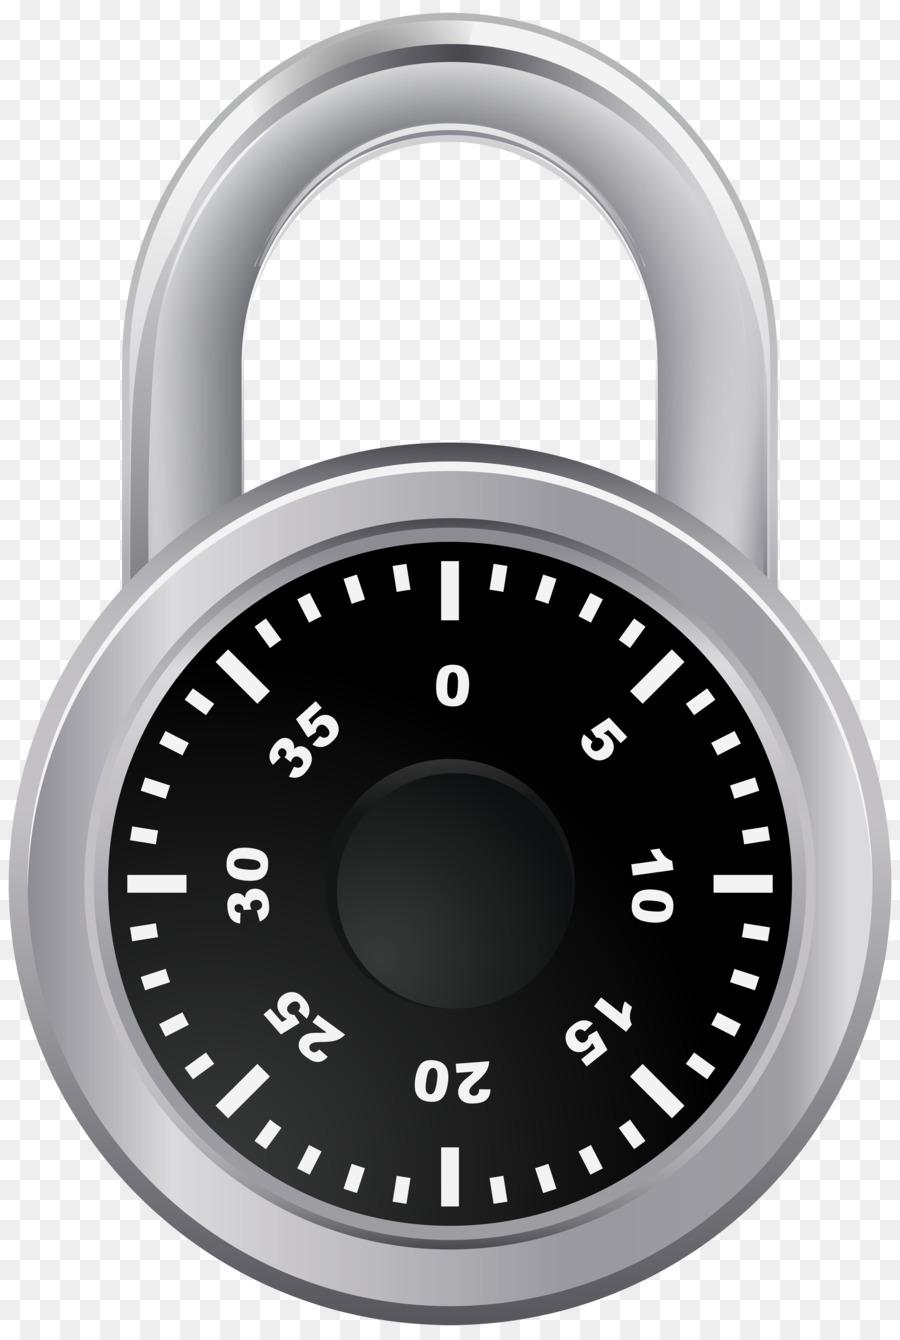 Lock clipart number lock. Transparent combination master